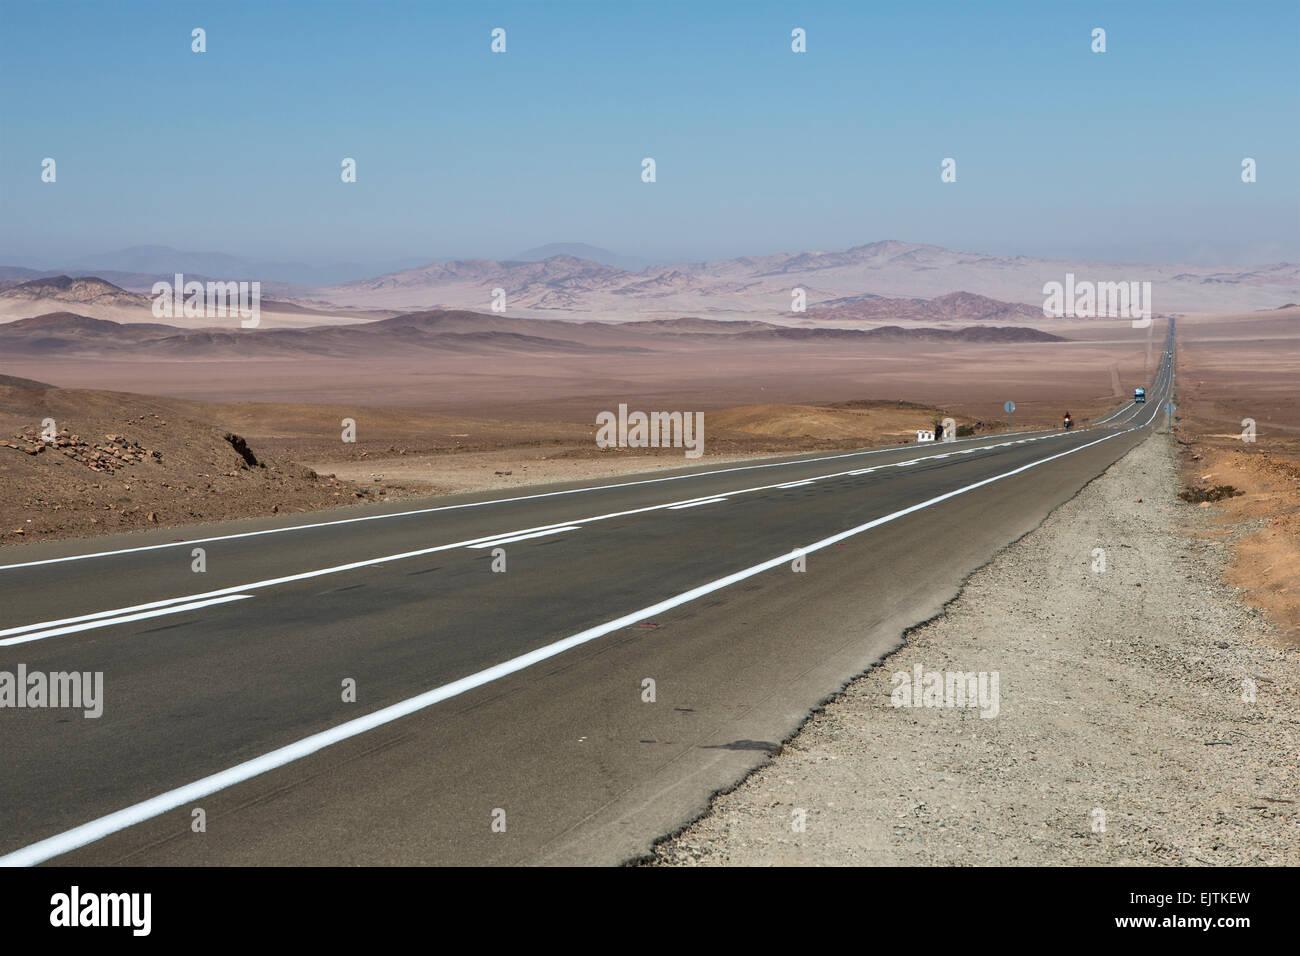 Route 5 (Ruta 5), part of the PanAmericano, passing through the Atacama Desert, Chile. - Stock Image